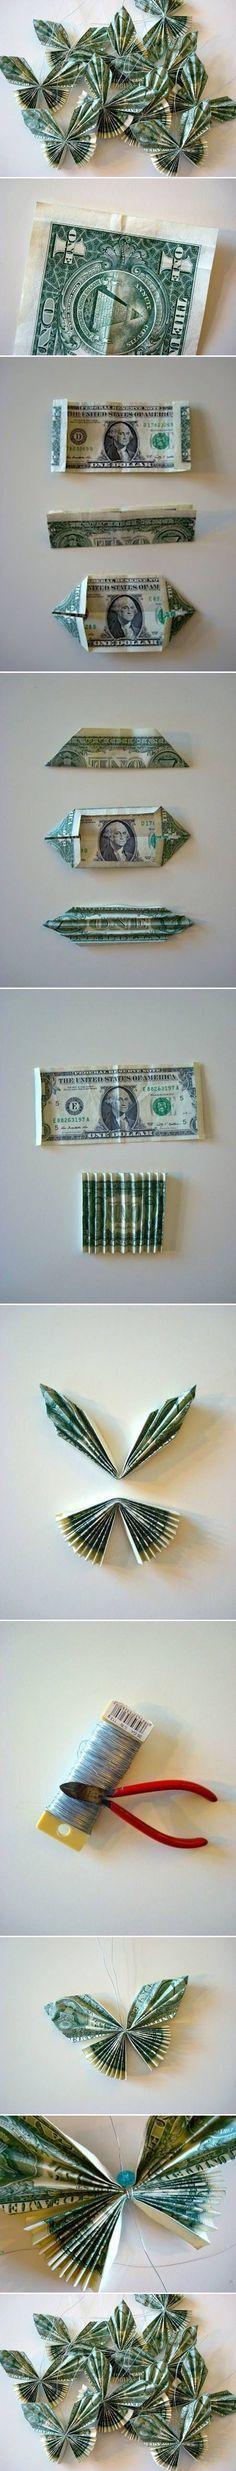 {DIY Dollar Bill Butterfly}